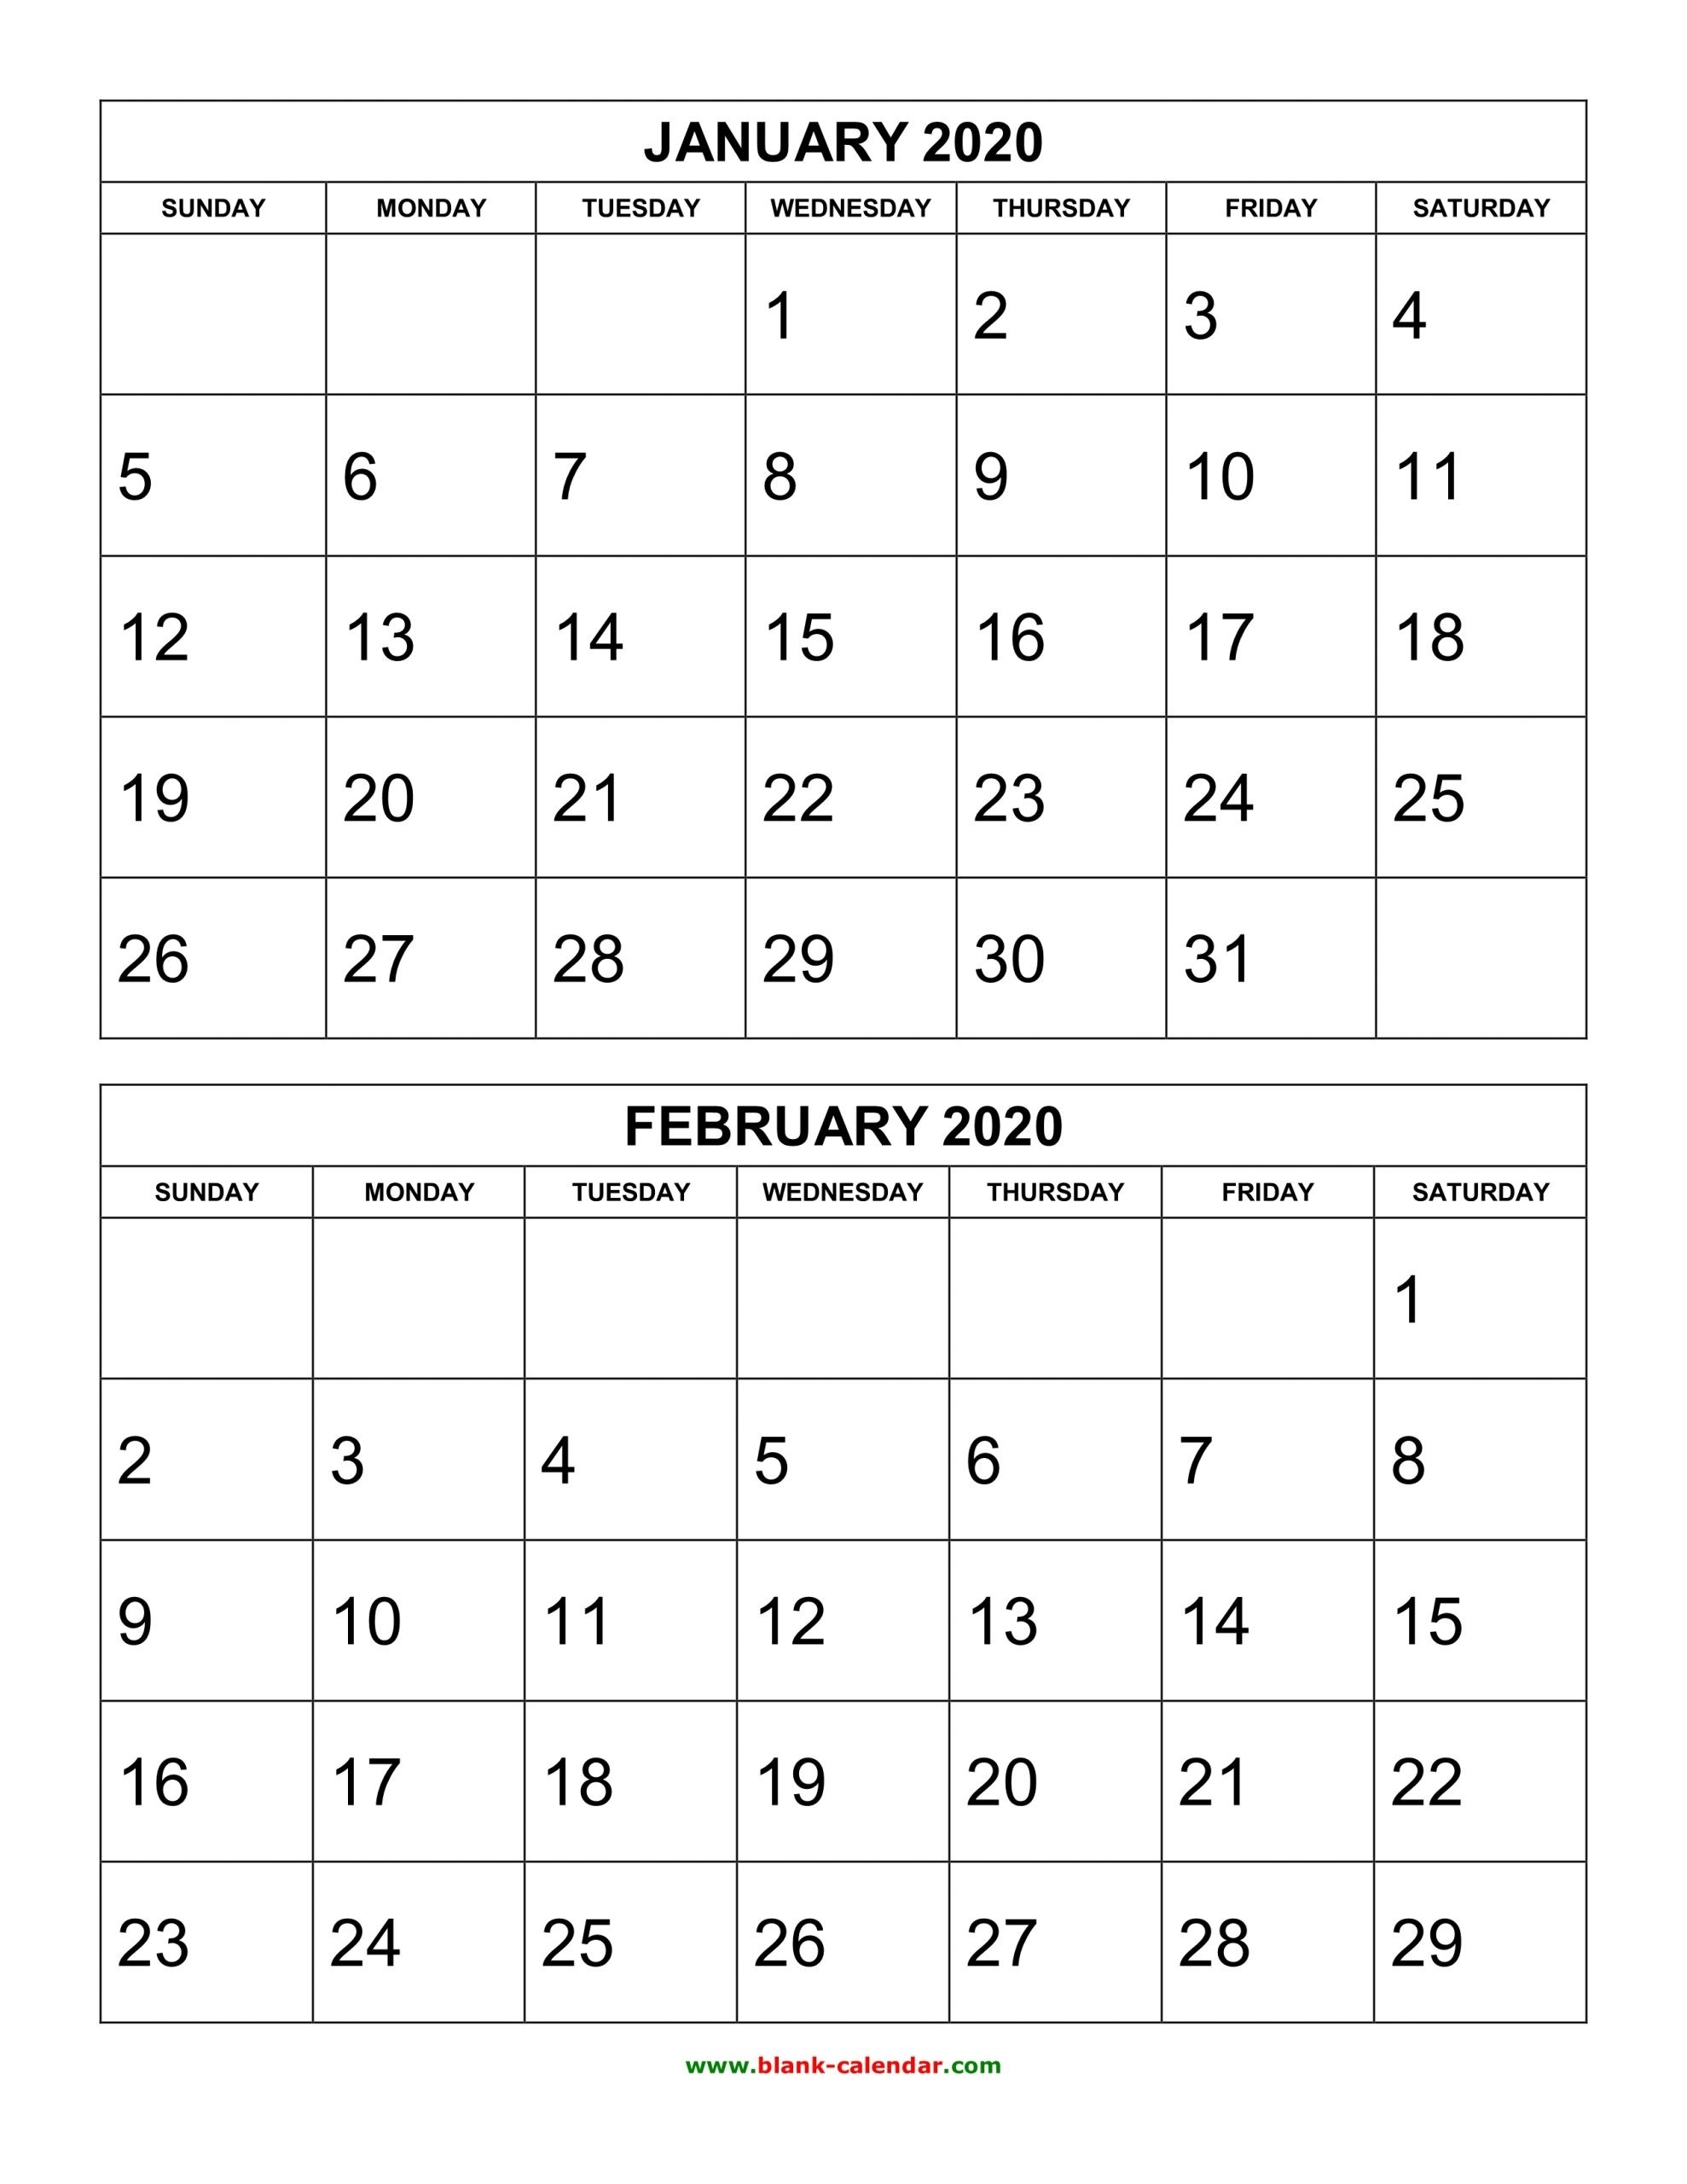 Get Half Page Calender 2020 | Calendar Printables Free Blank-Fill In Printable Calendar 2021